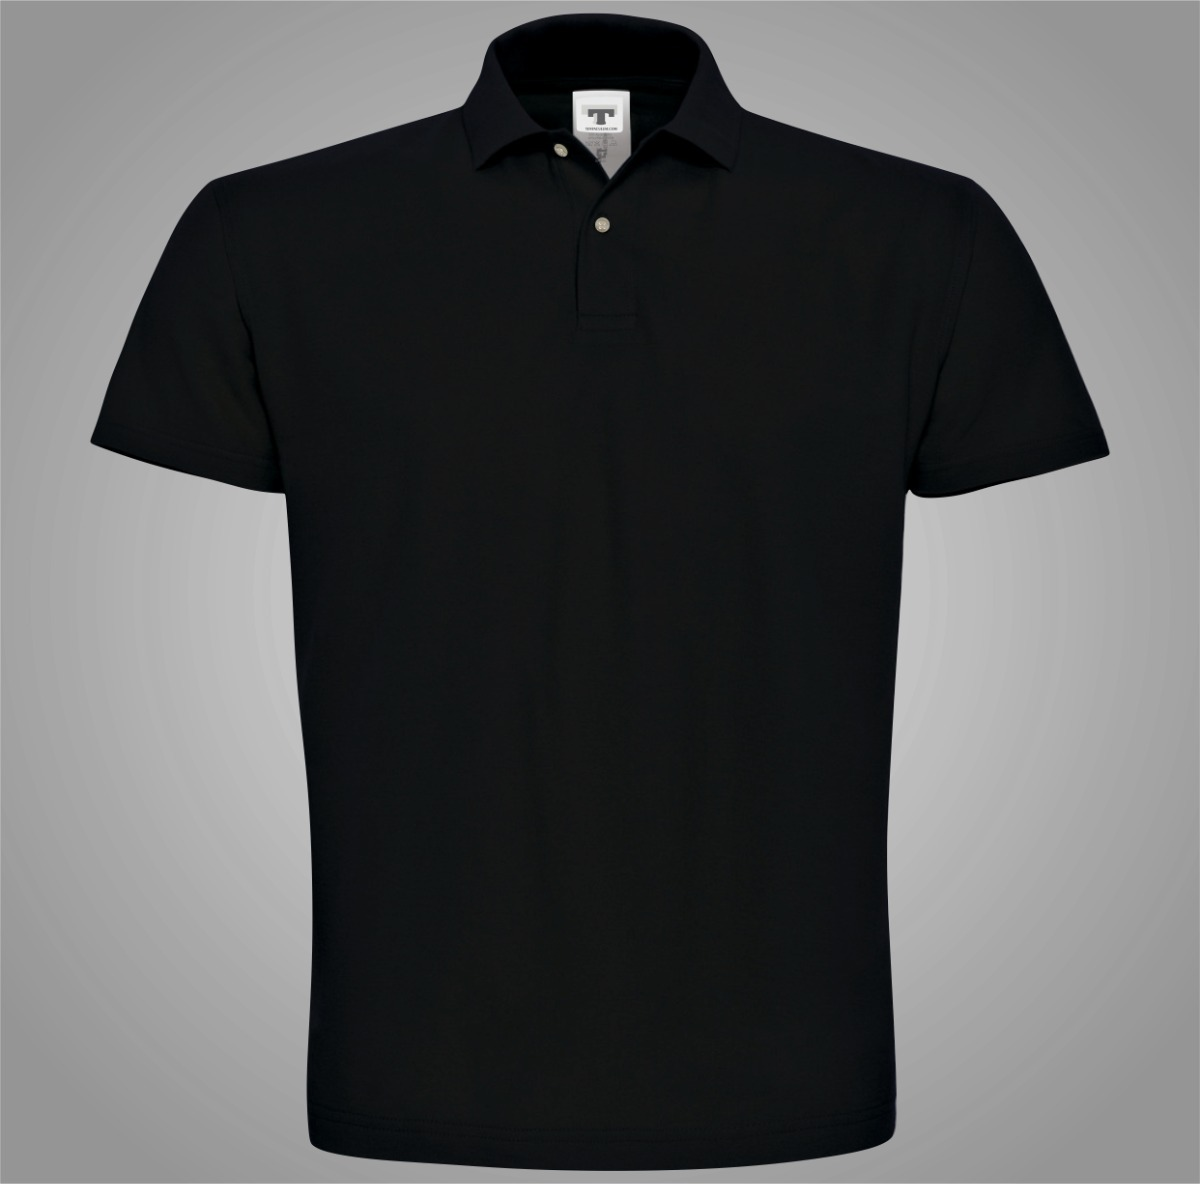 camisa gola polo masculina branco preto azul verde marinho. Carregando zoom. ddbe303760247